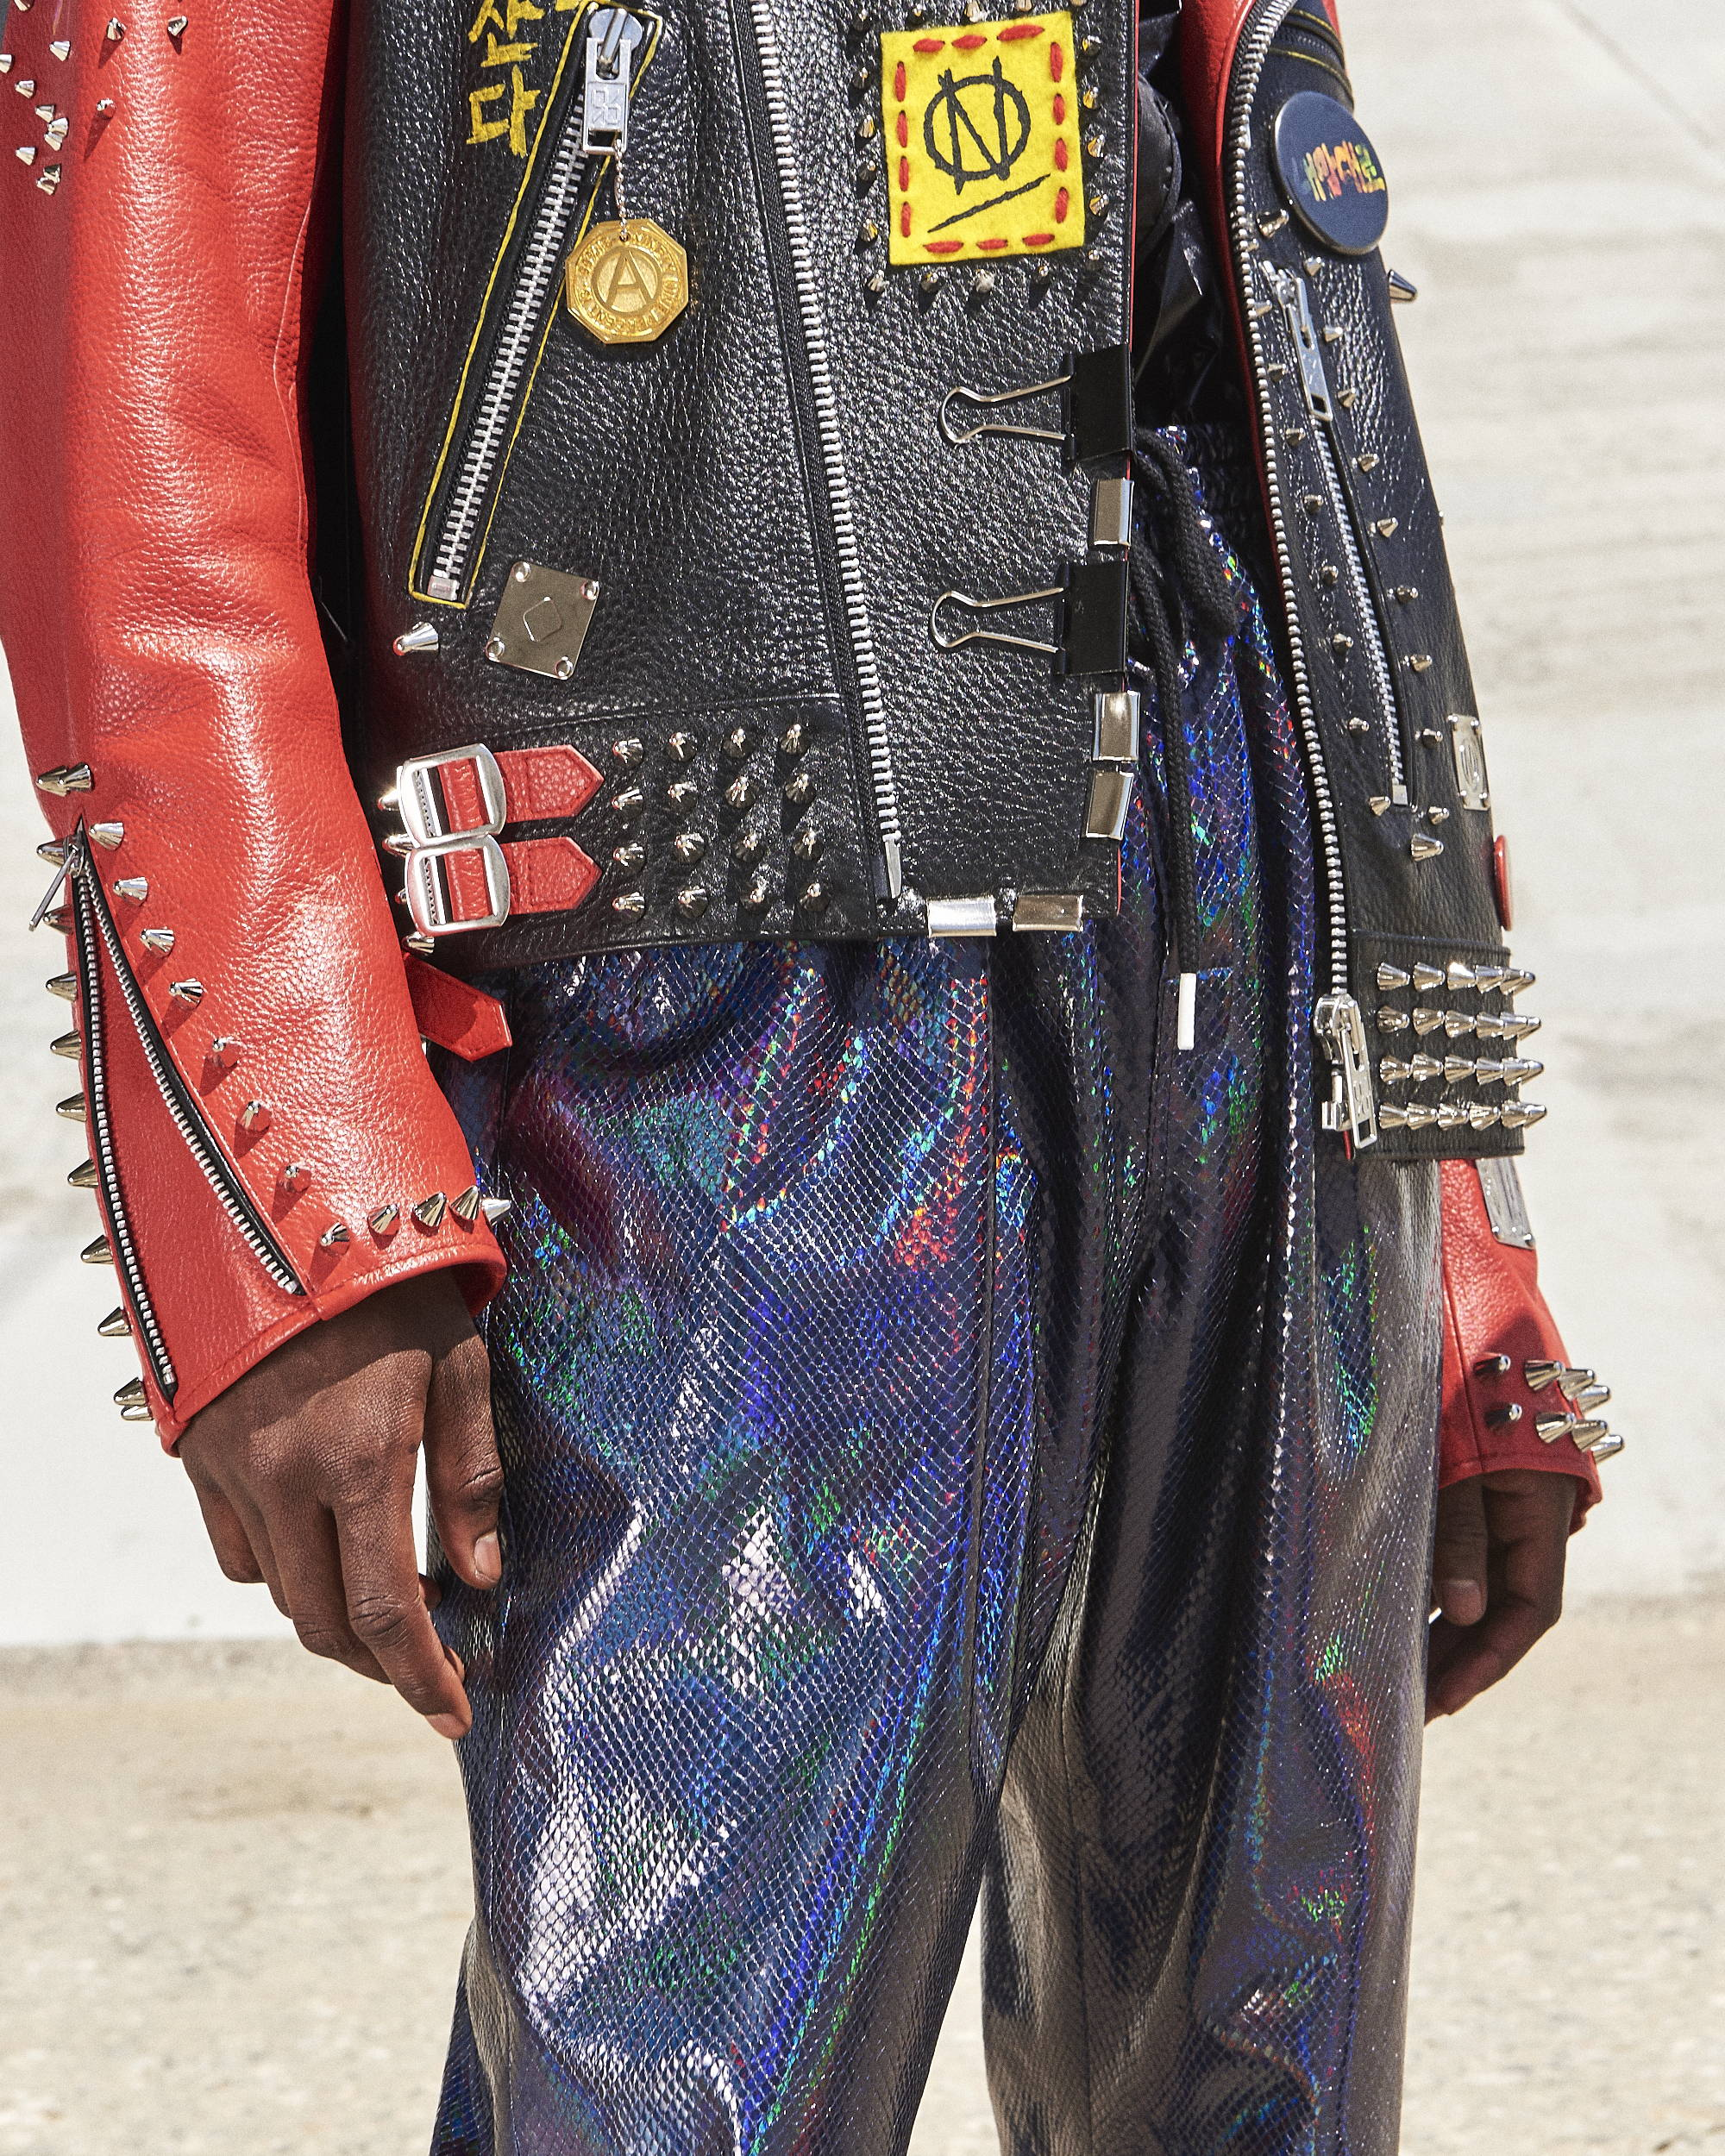 99%IS Studded Leather Jacket Detail HLNR Hlorenzo